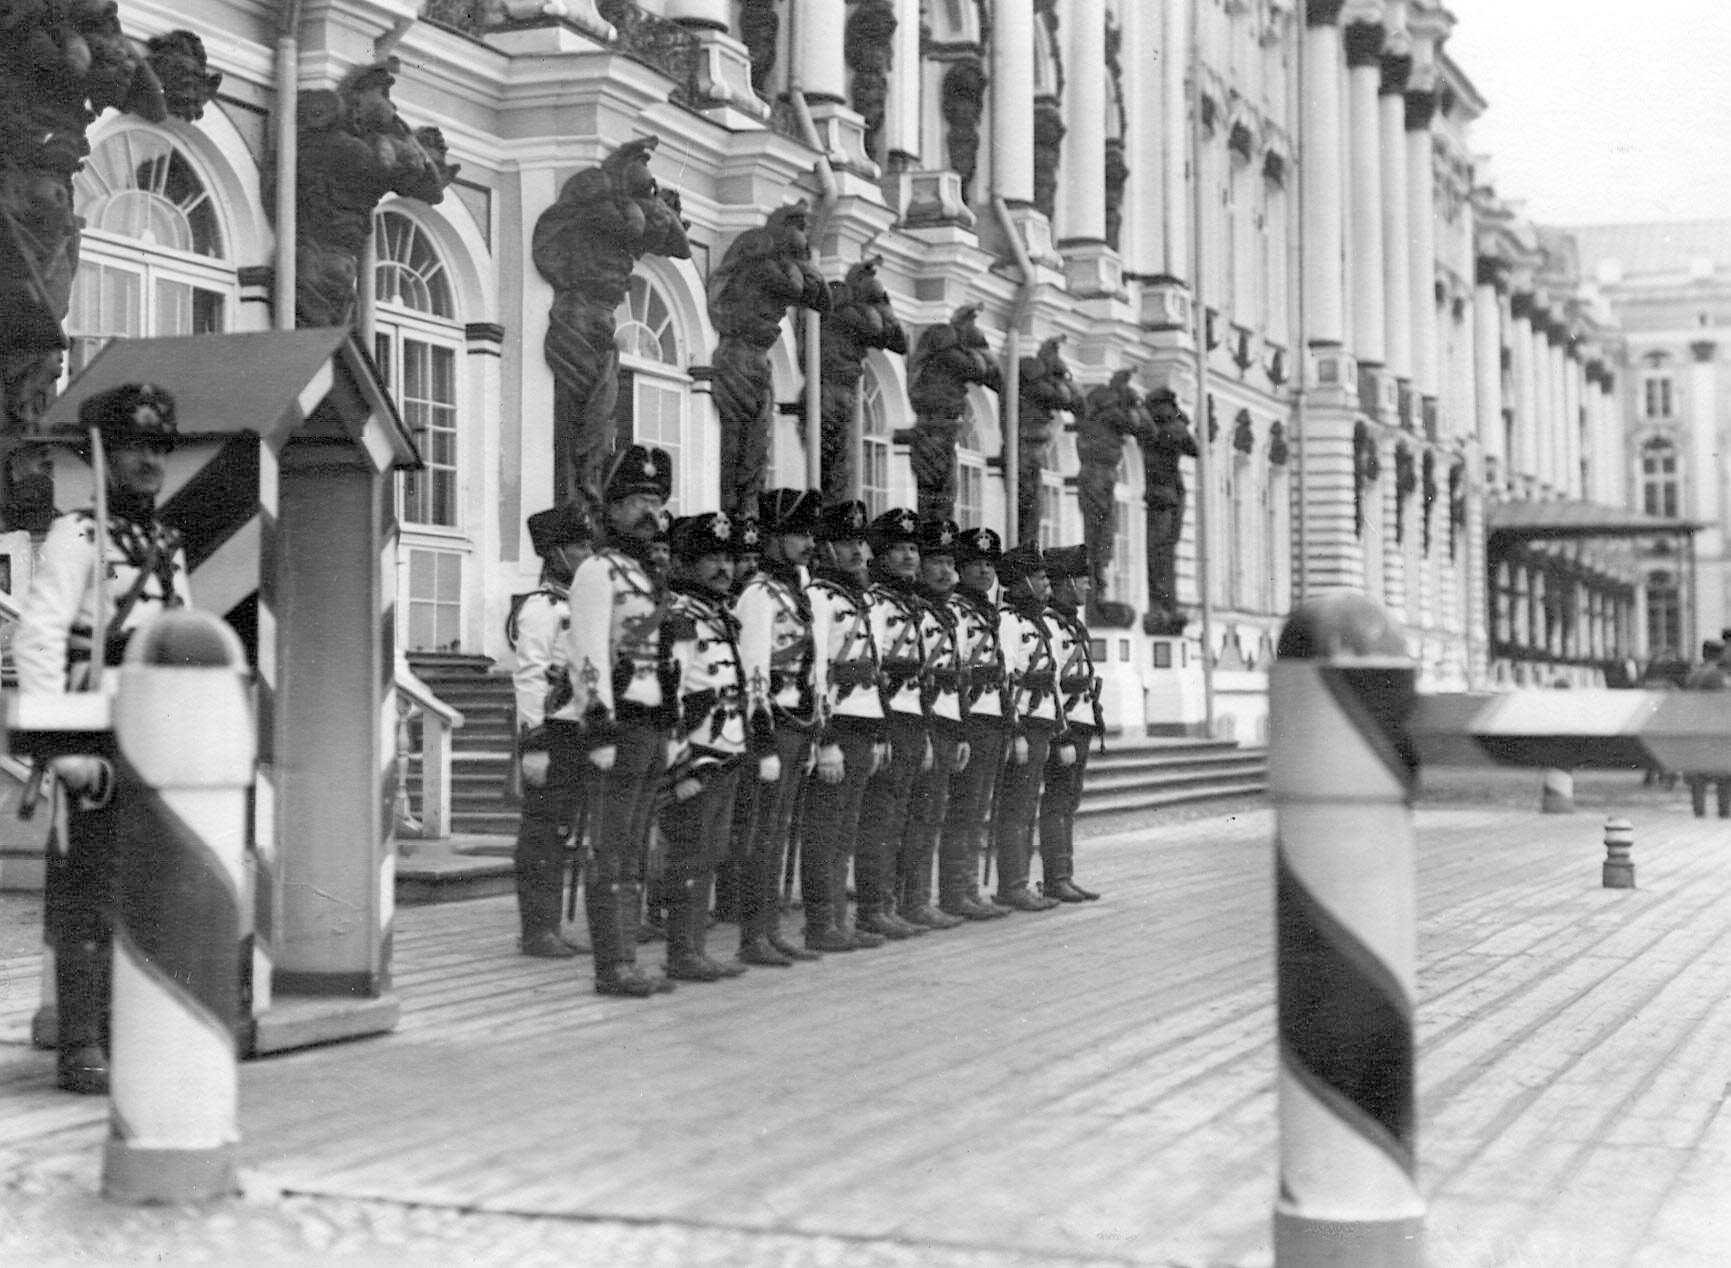 1909-1913. Караул гусар у здания Екатерининского дворца